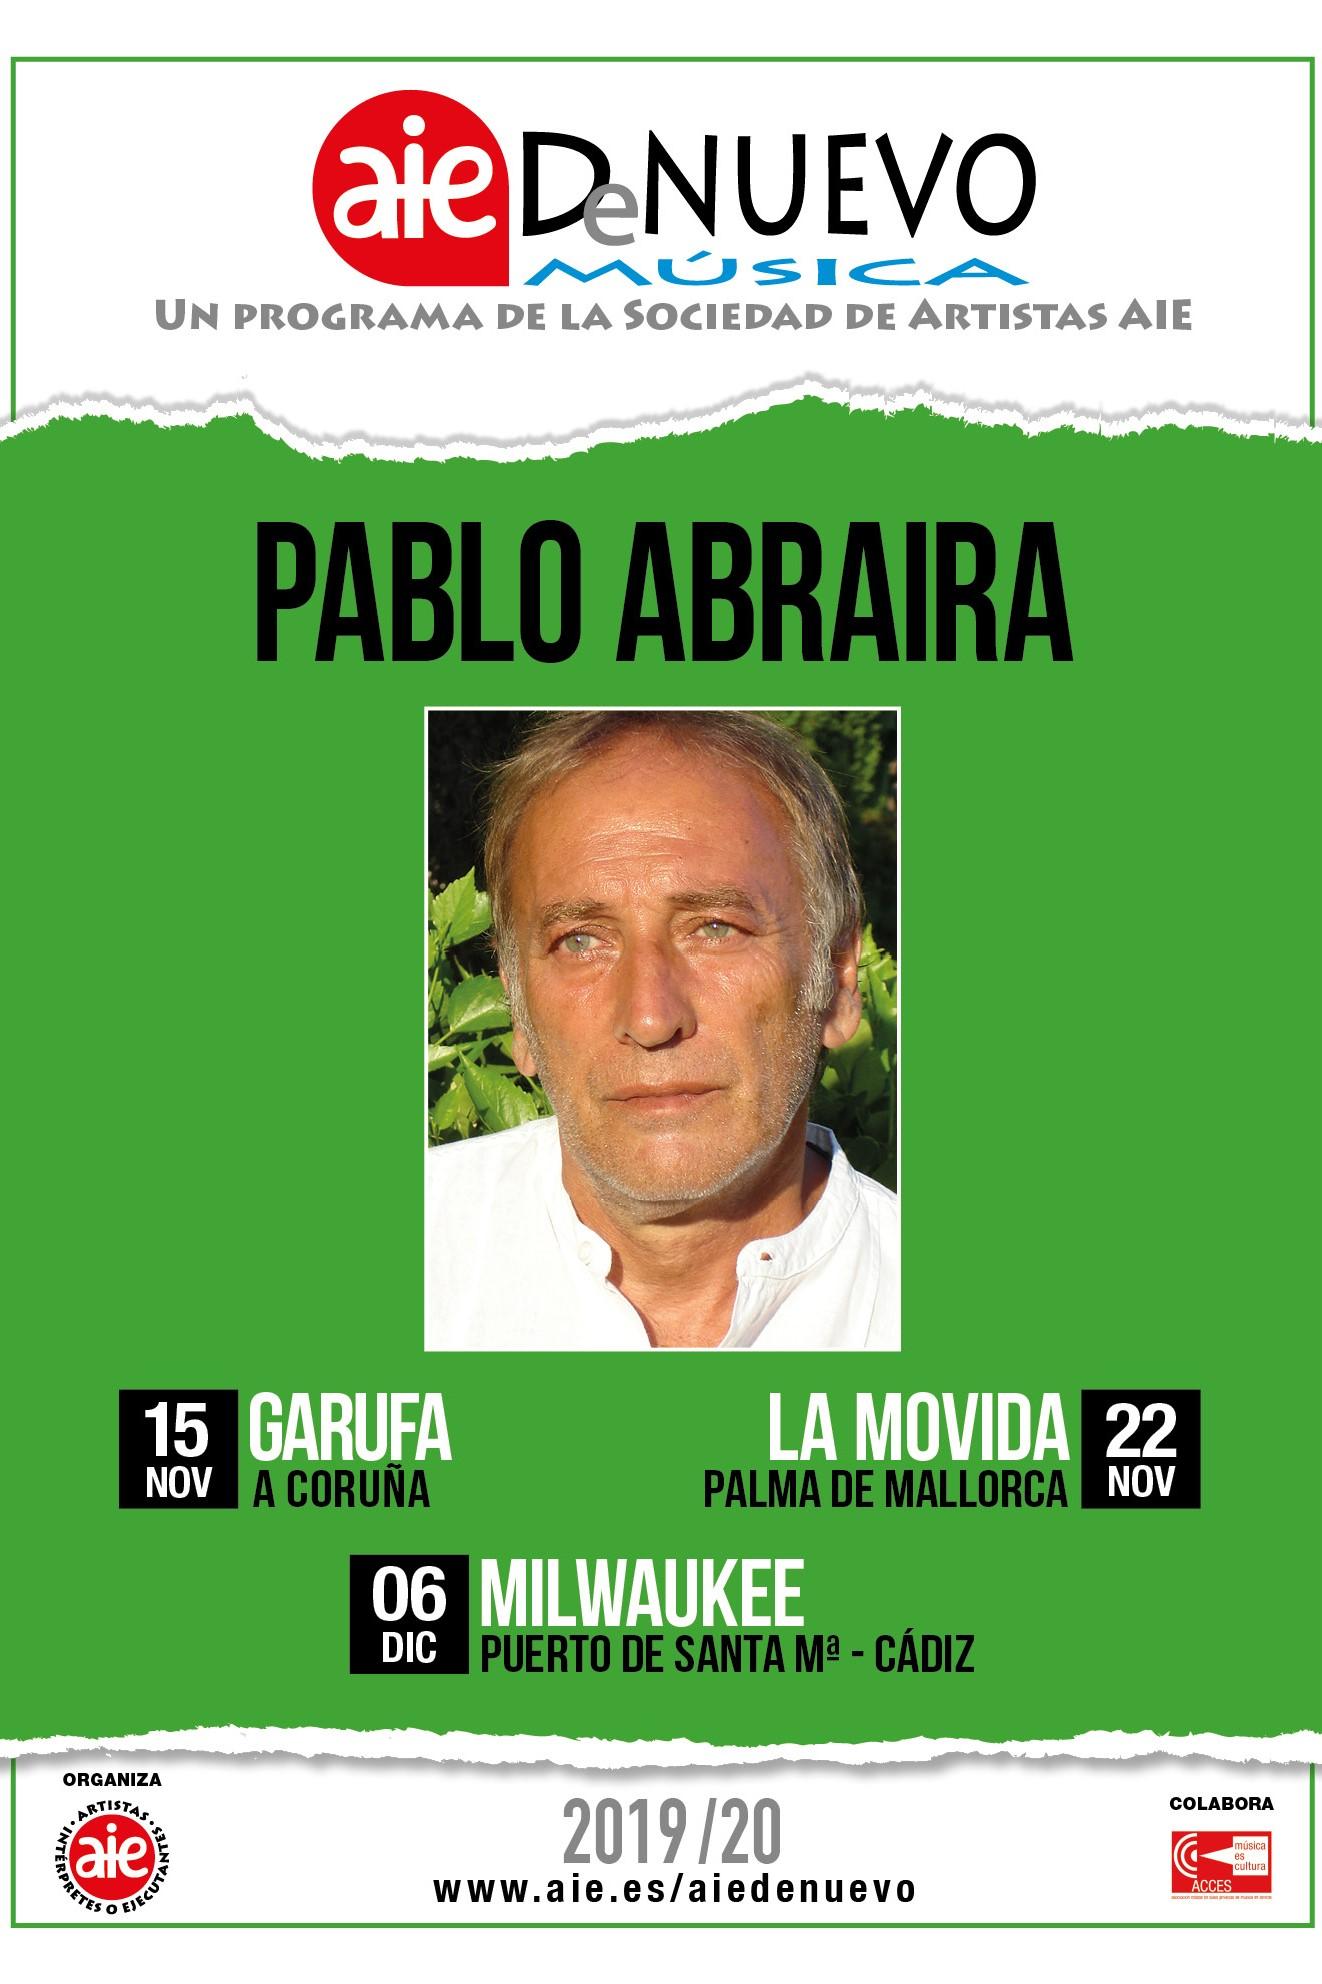 pablo abraida ed (2)